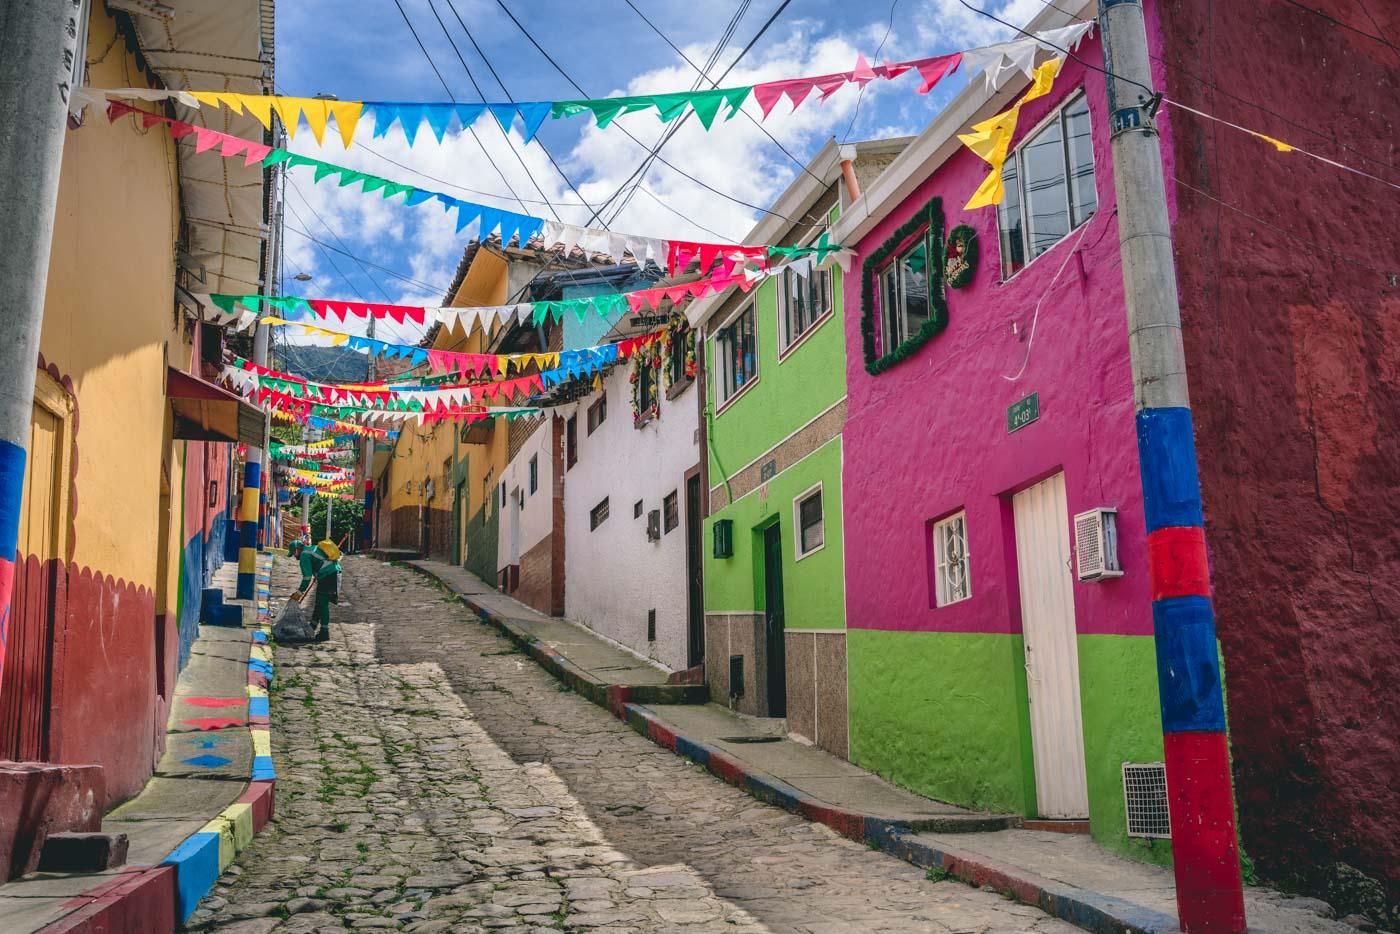 Colourful street in Egipto Bario, Bogota